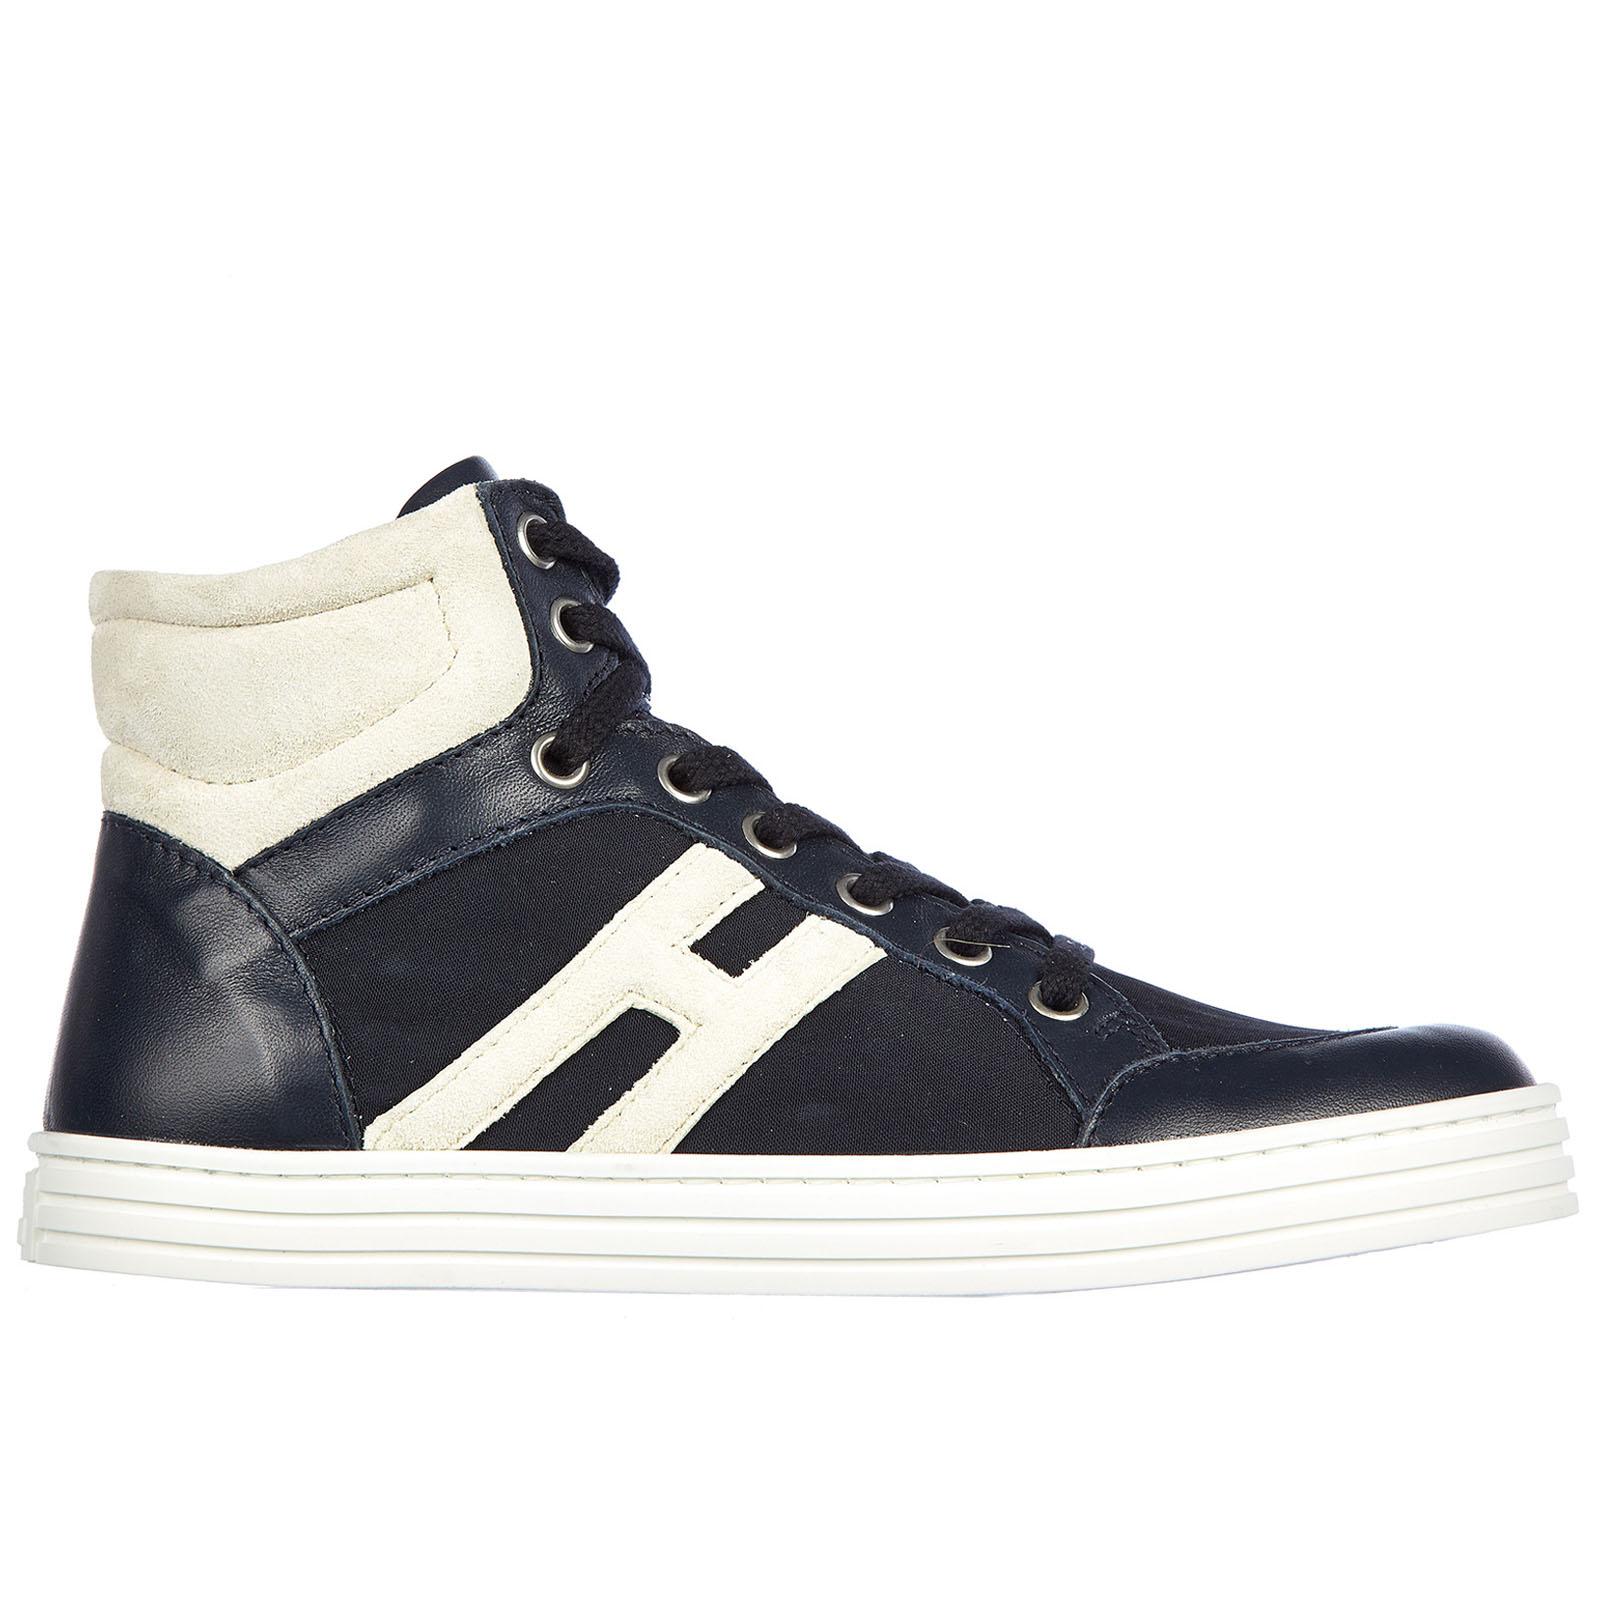 ed97b500a0ee6 Chaussures baskets sneakers enfant garçon pelle rebel polacco basket ...